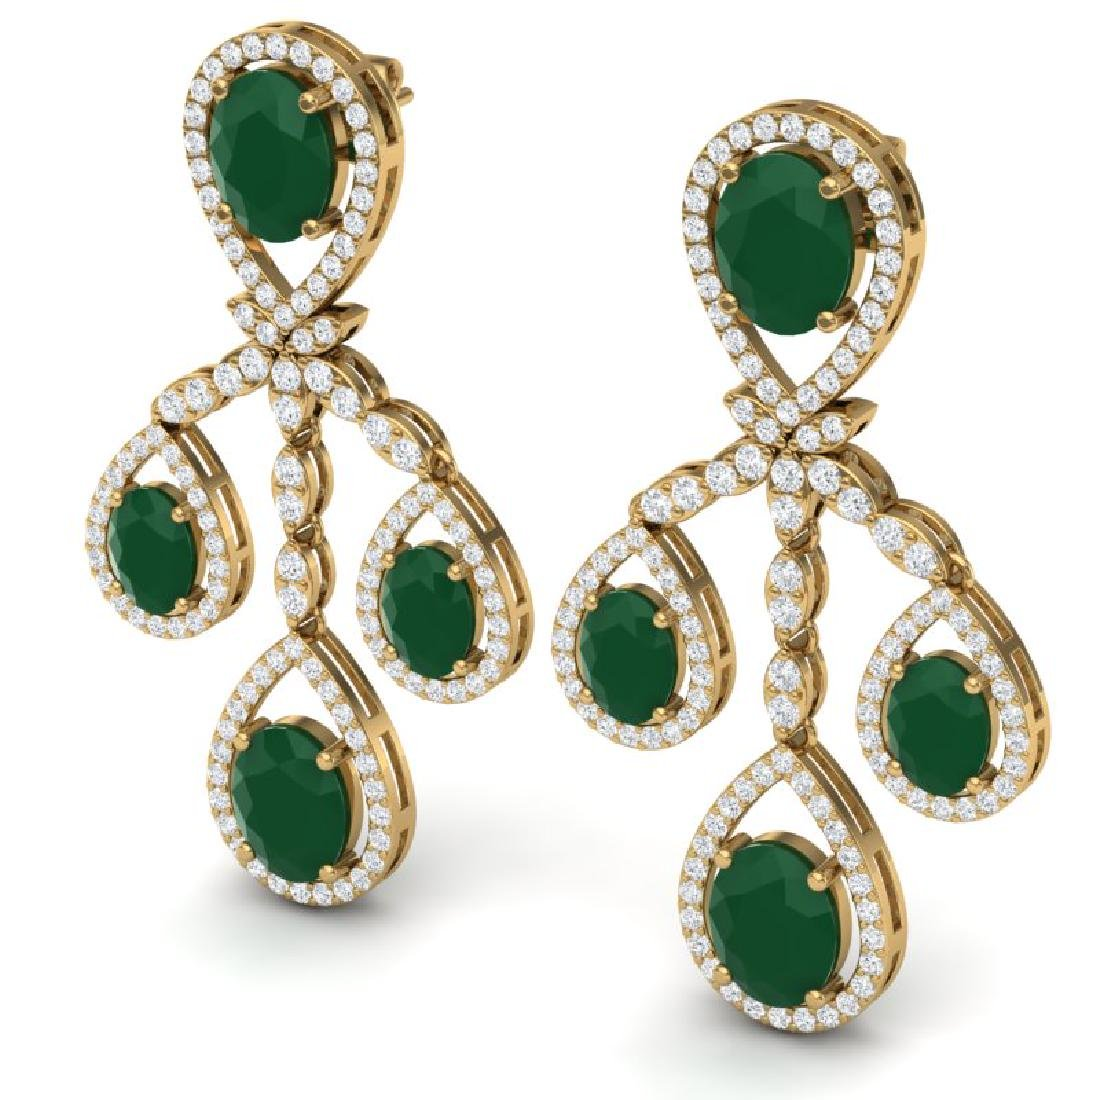 25.08 CTW Royalty Emerald & VS Diamond Earrings 18K - 2